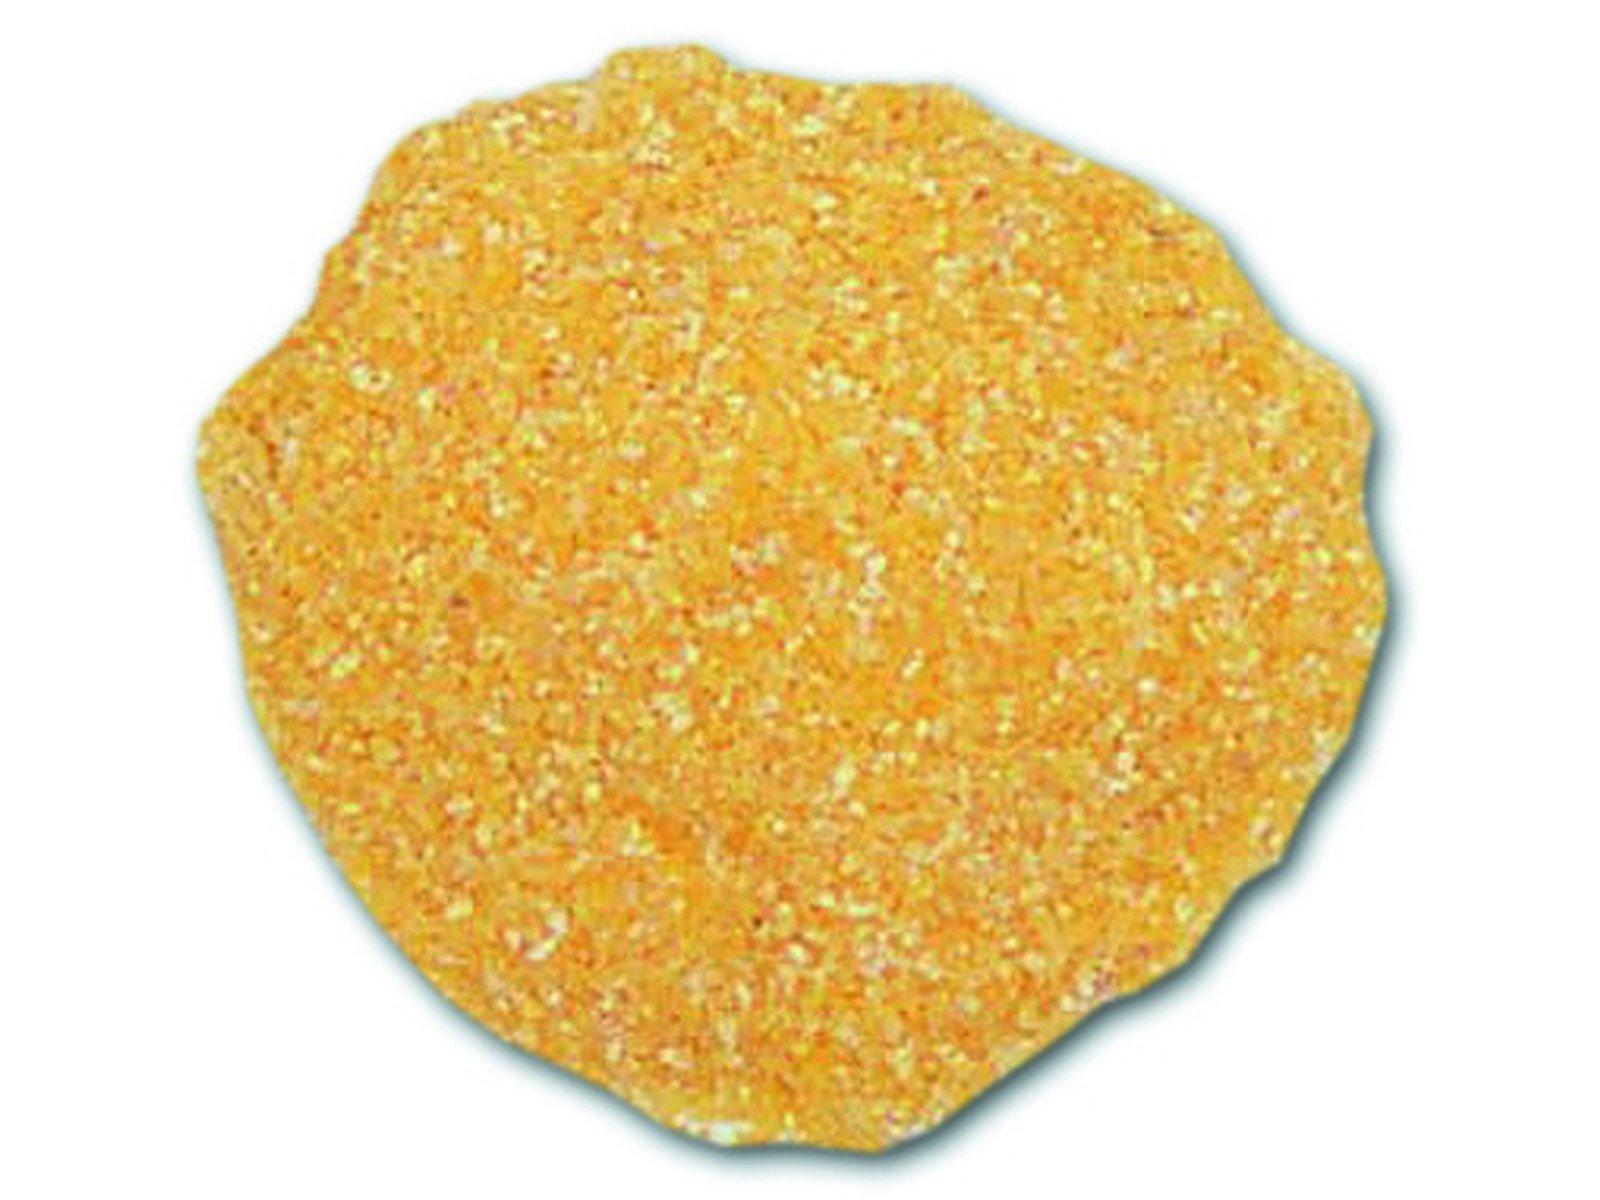 Granulated Corn Meal (Polenta) 25 lbs.